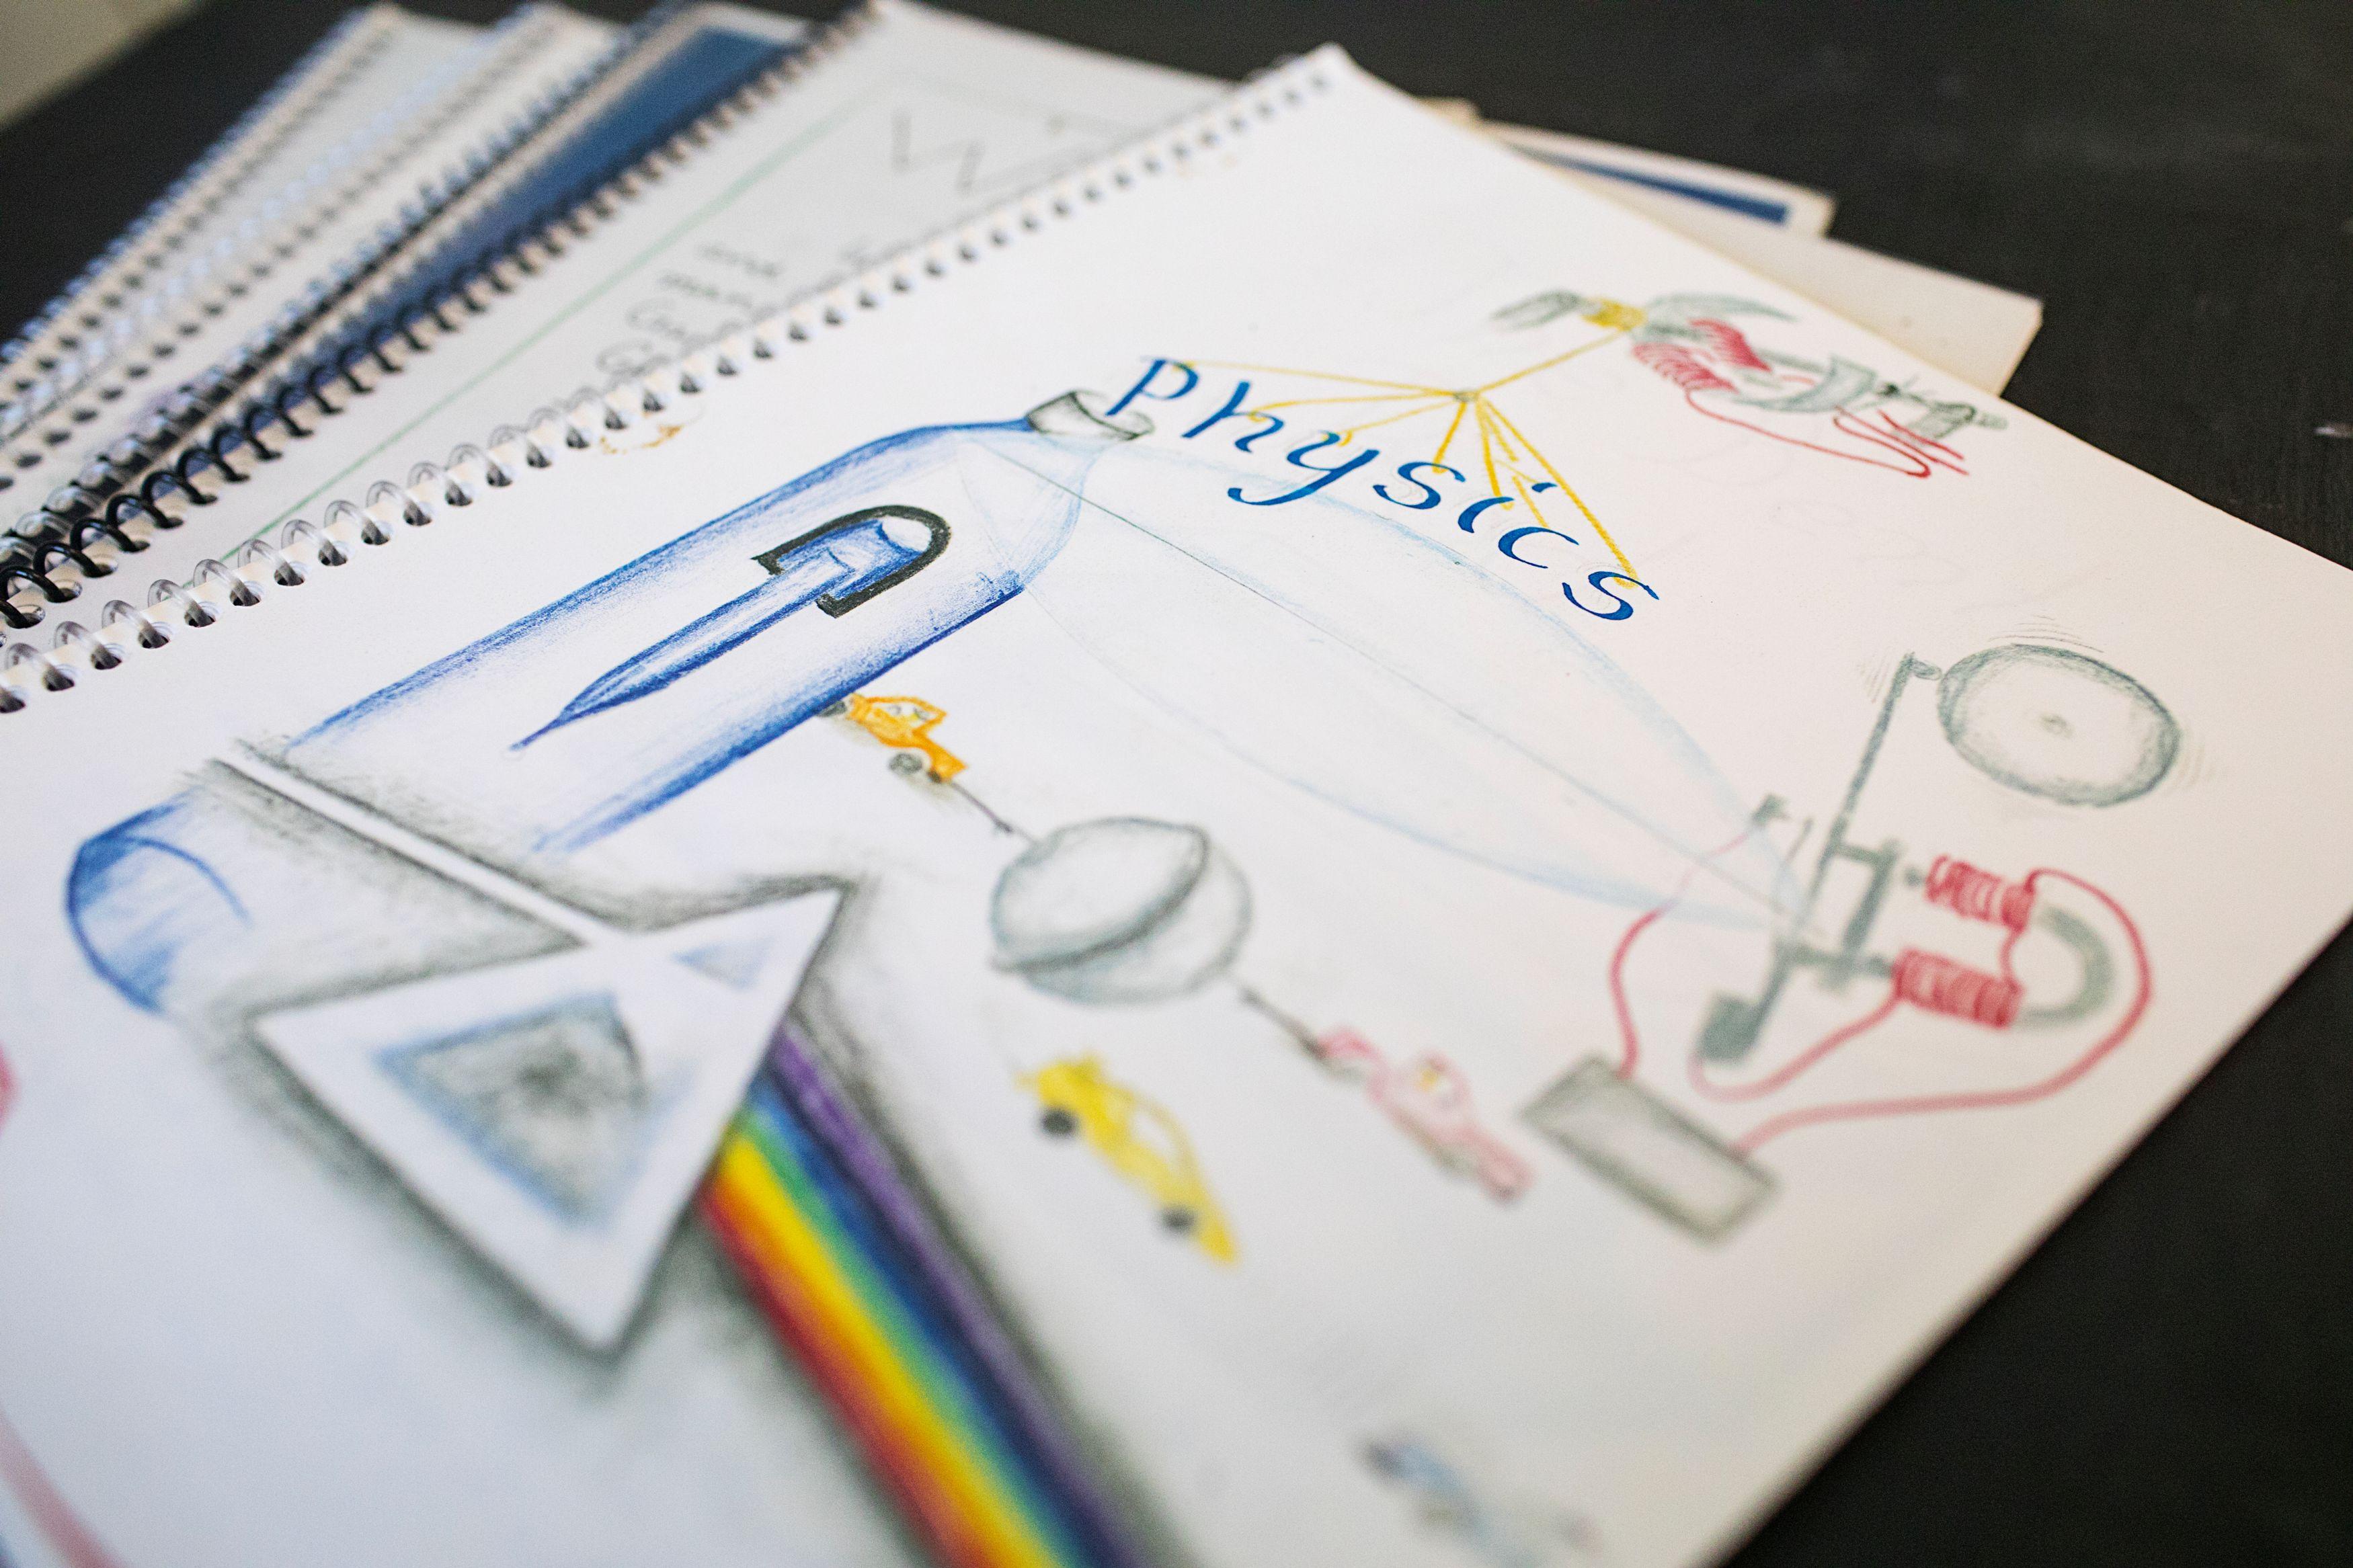 Student handmade textbook on light refraction